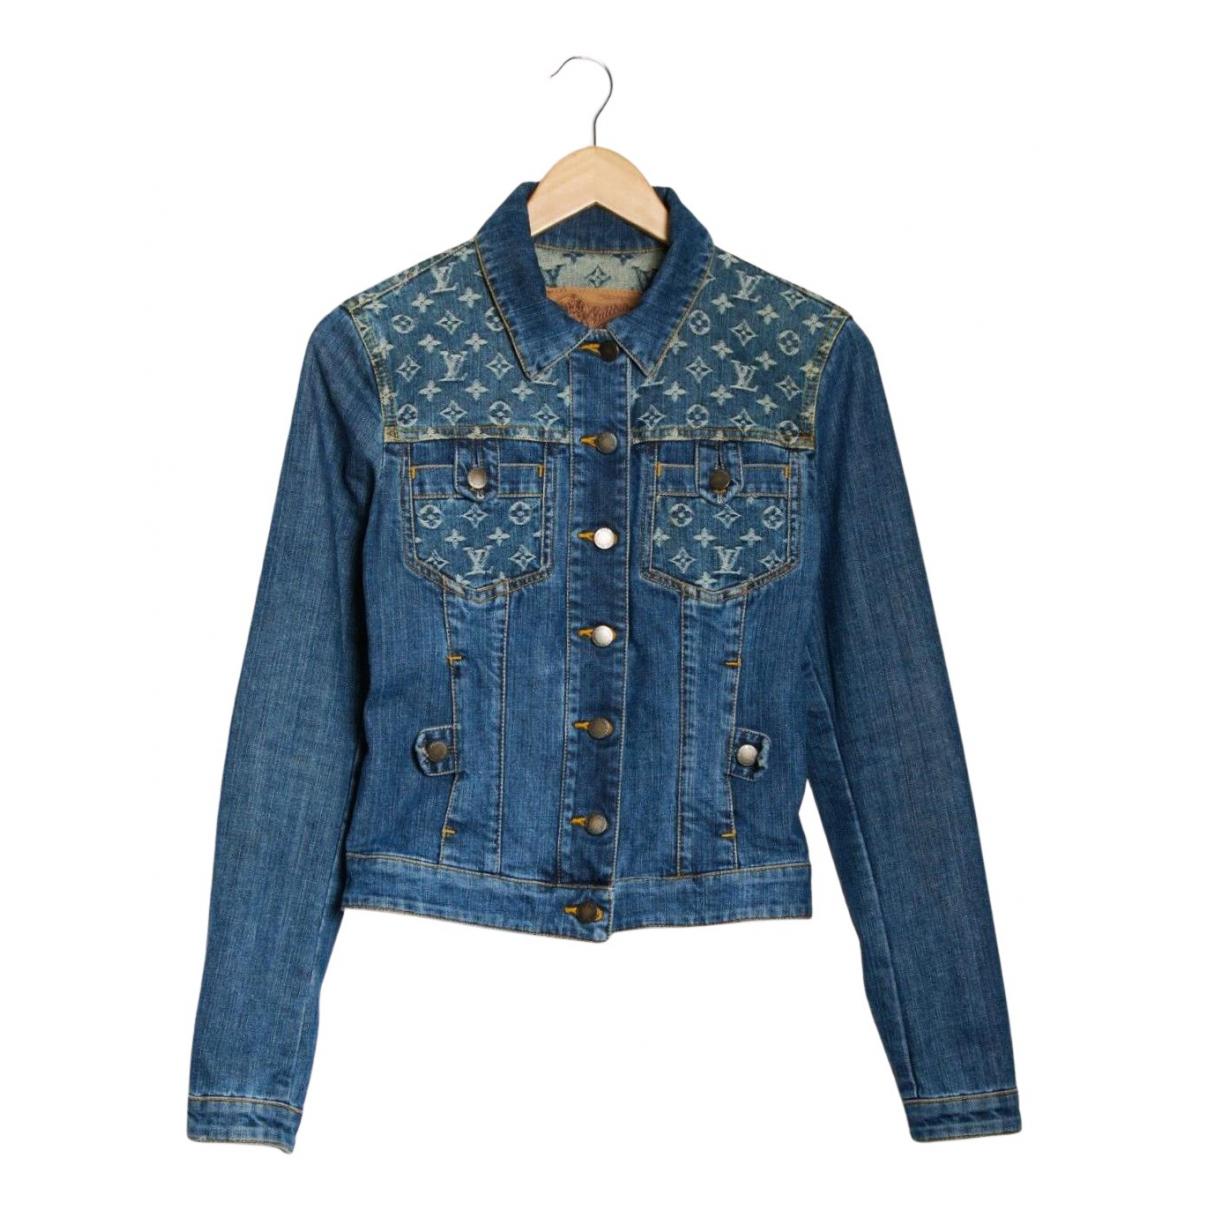 Louis Vuitton \N Jacke in  Blau Denim - Jeans